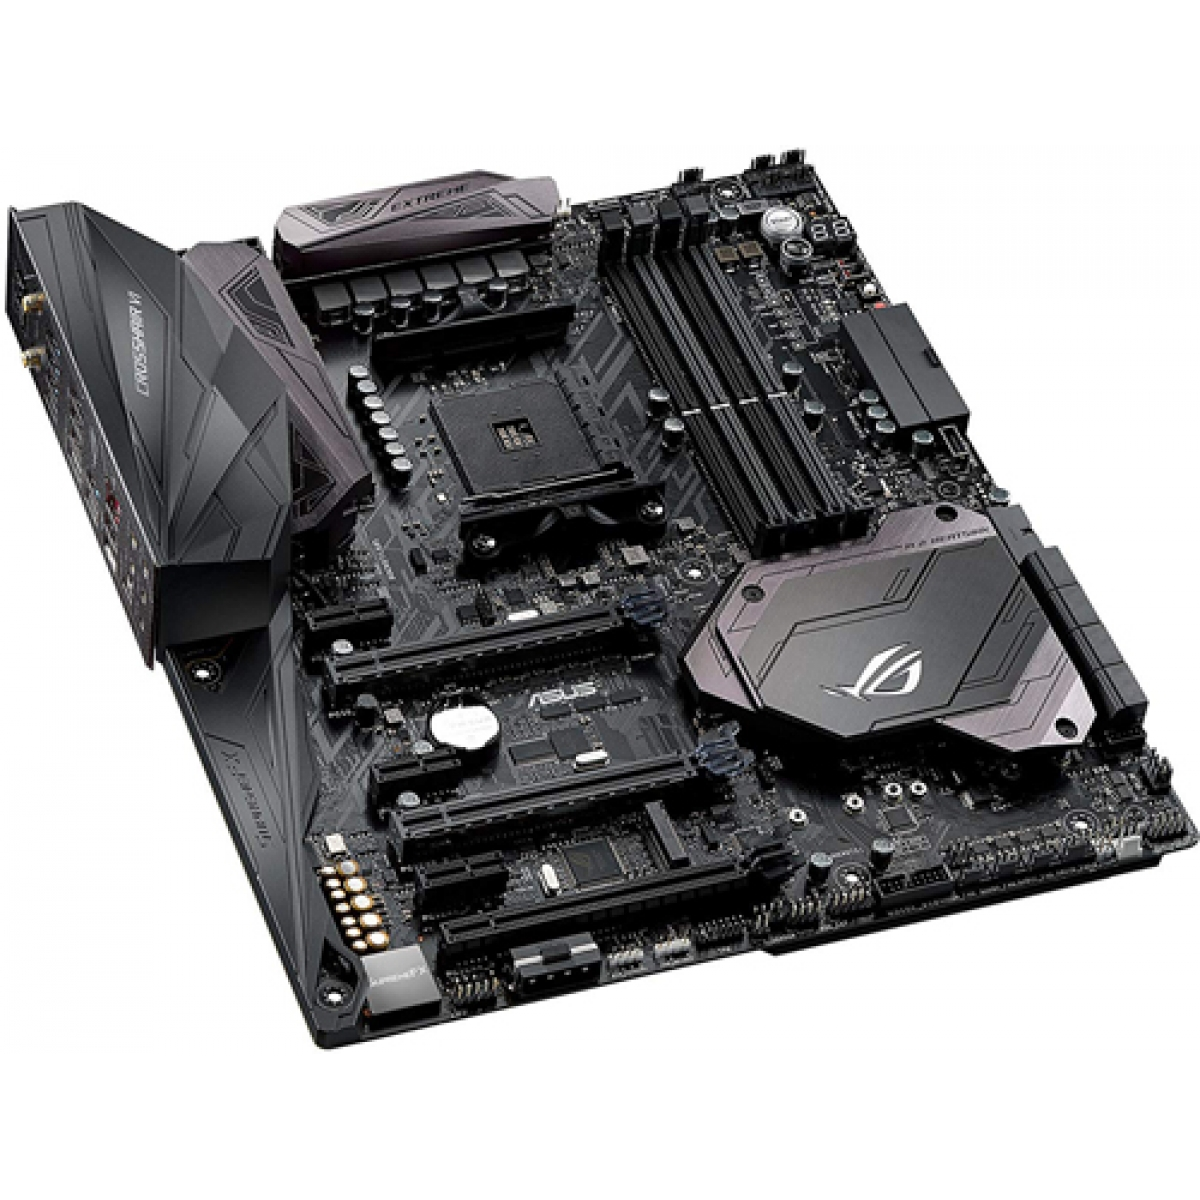 Placa Mãe Asus Rog Crosshair VI Extreme, Chipset X370, AMD AM4, eATX, DDR4